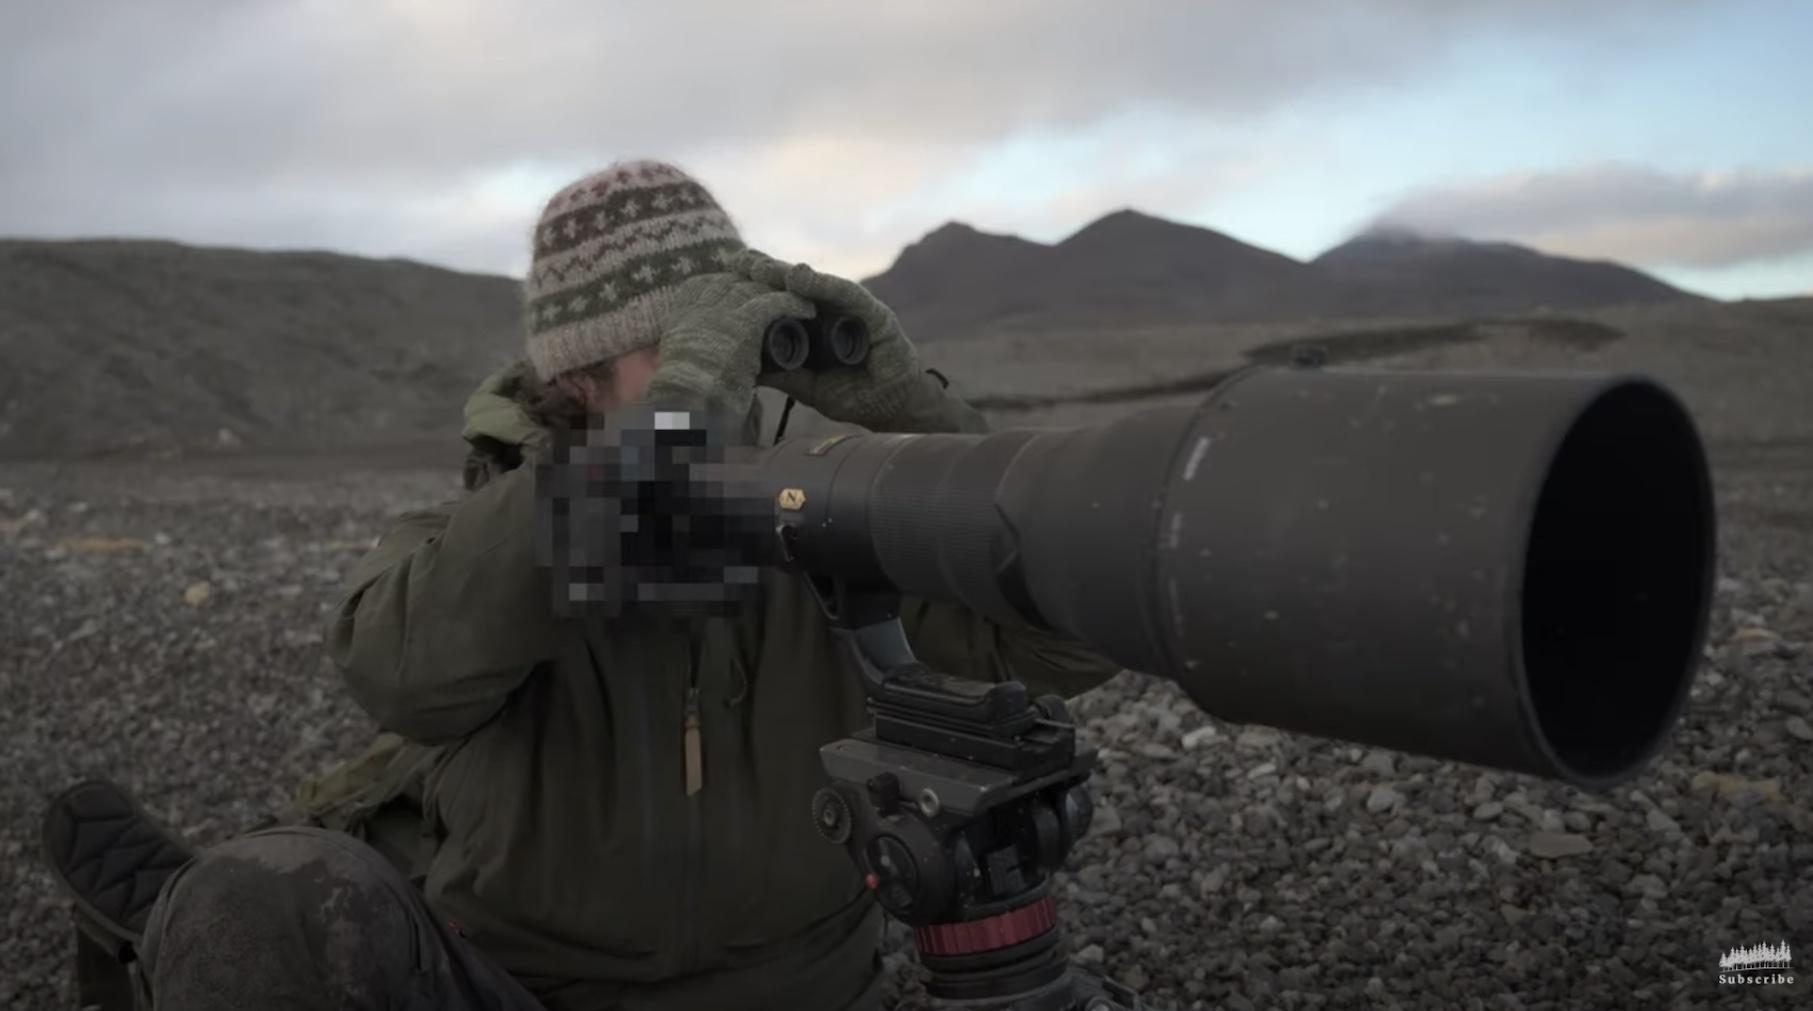 Morten Hilmer has the Nikon Z9